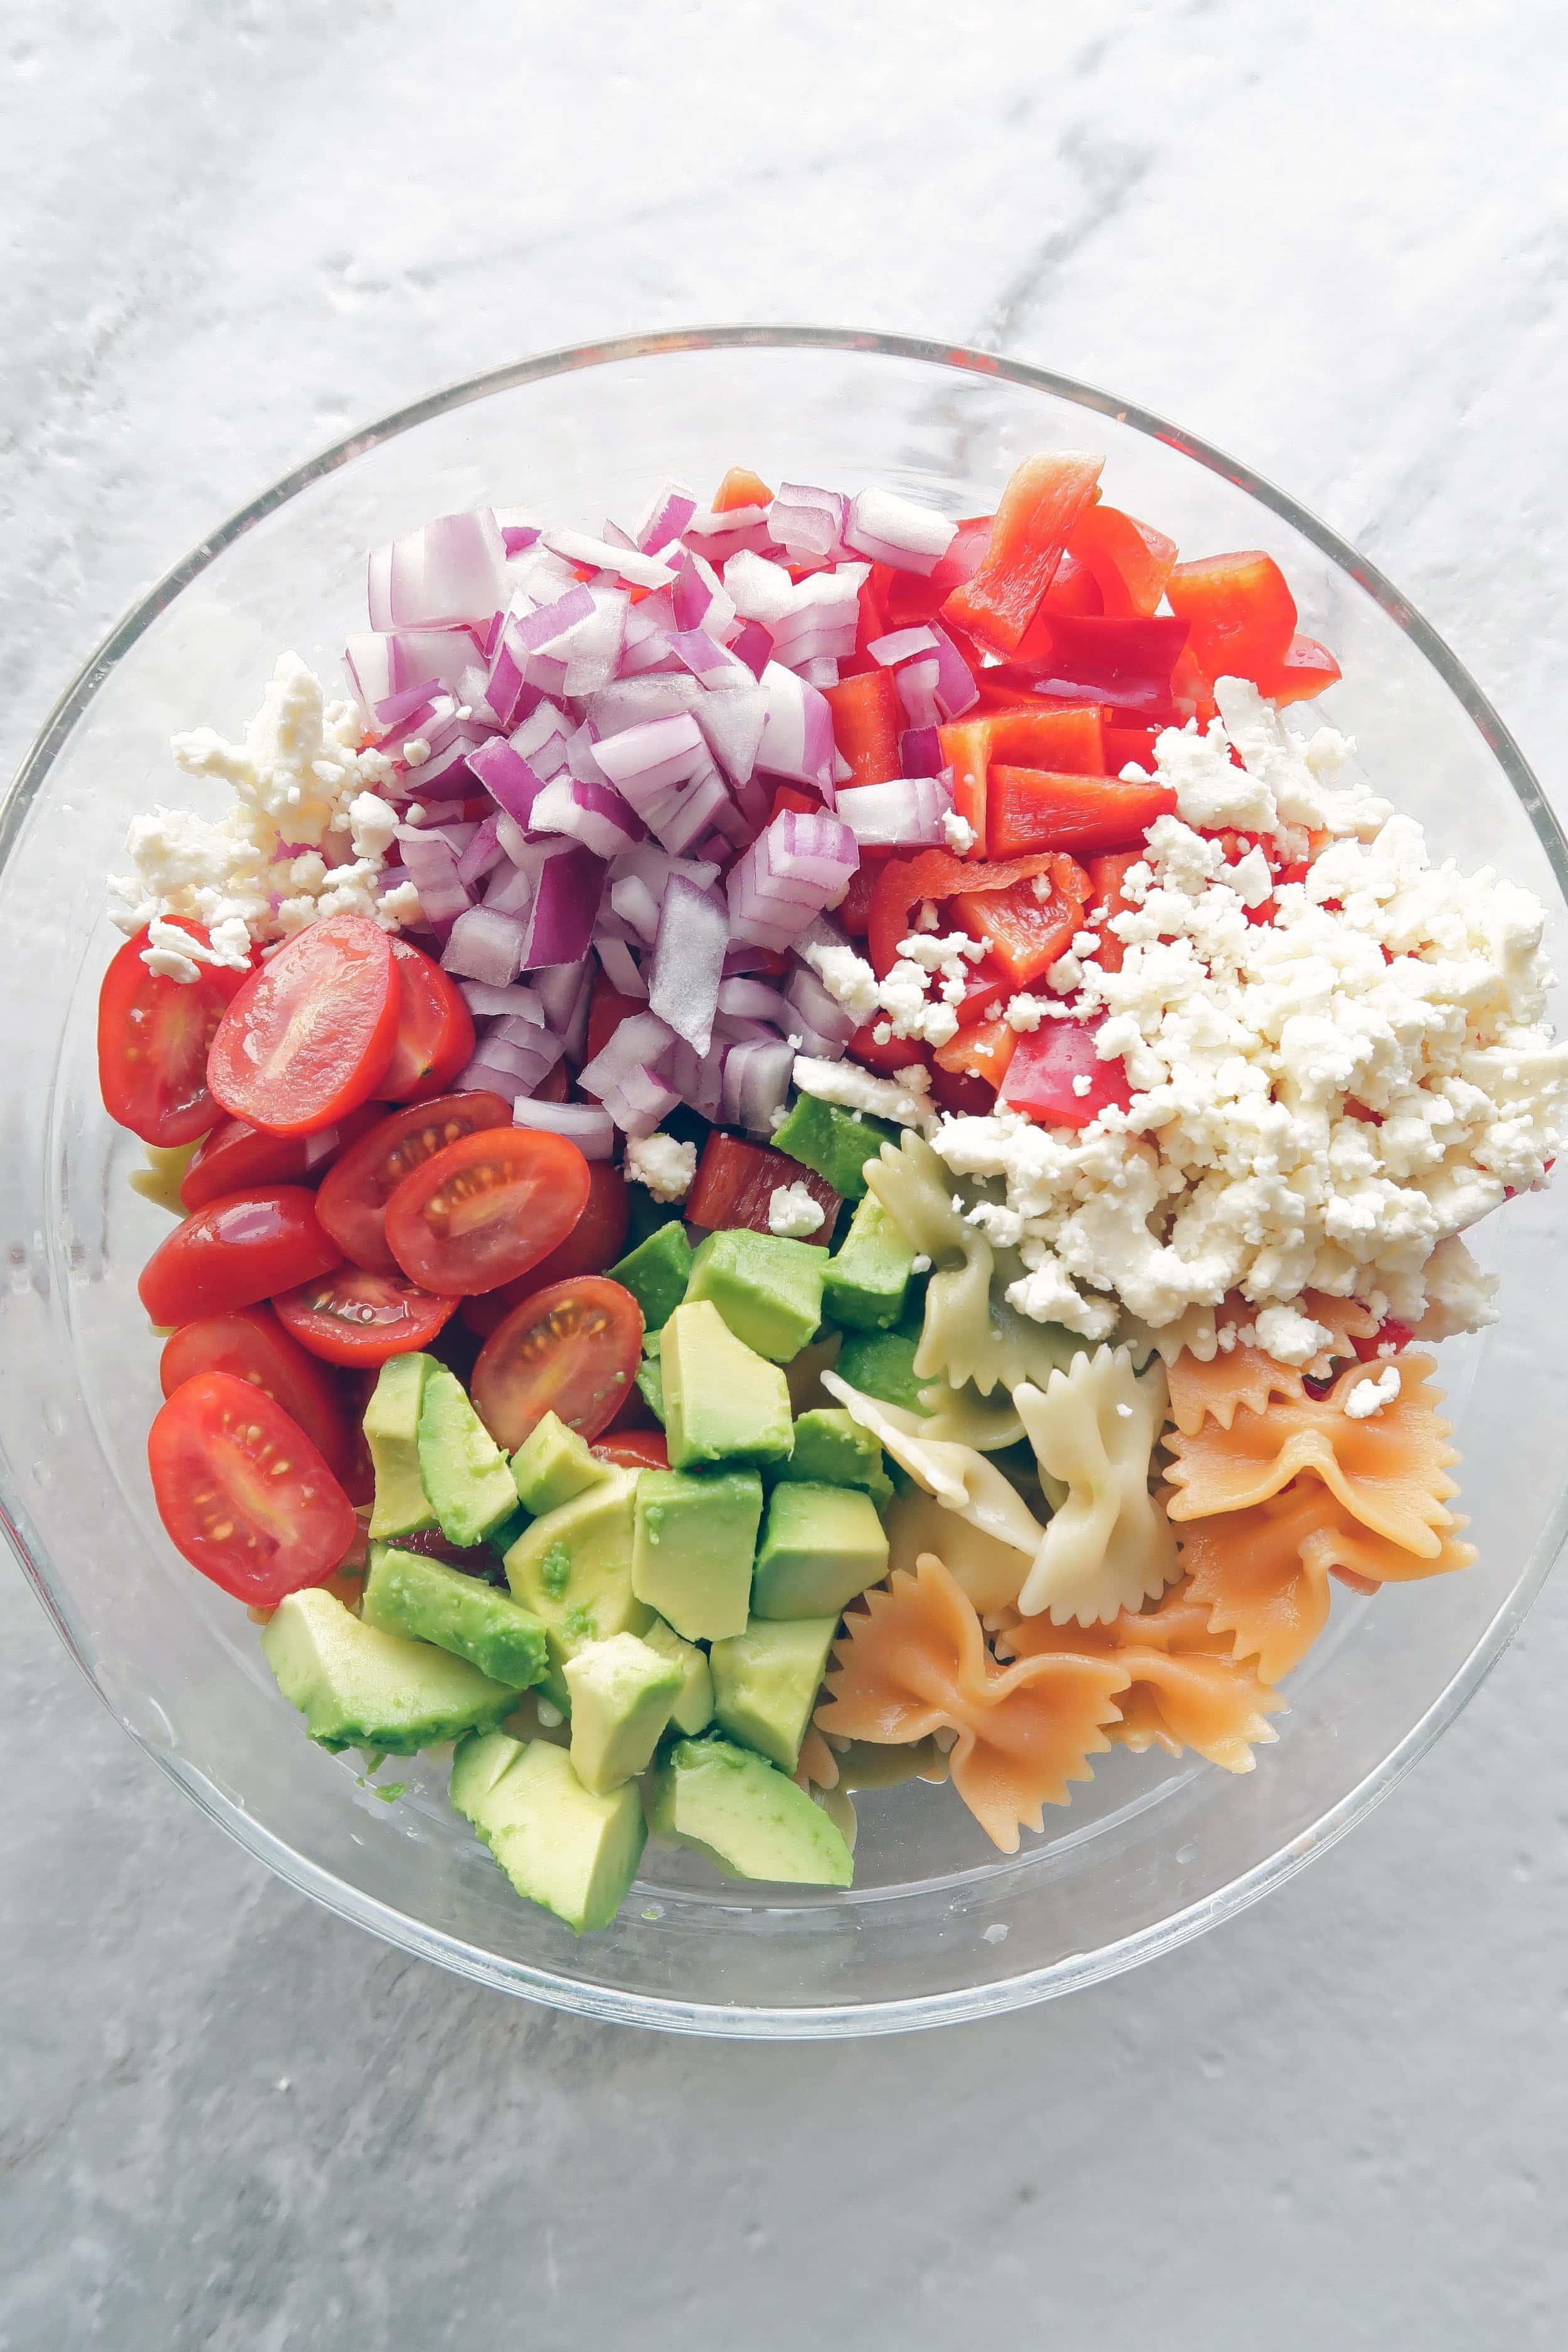 Basil Avocado Pesto Vegetable Pasta Salad Yay For Food